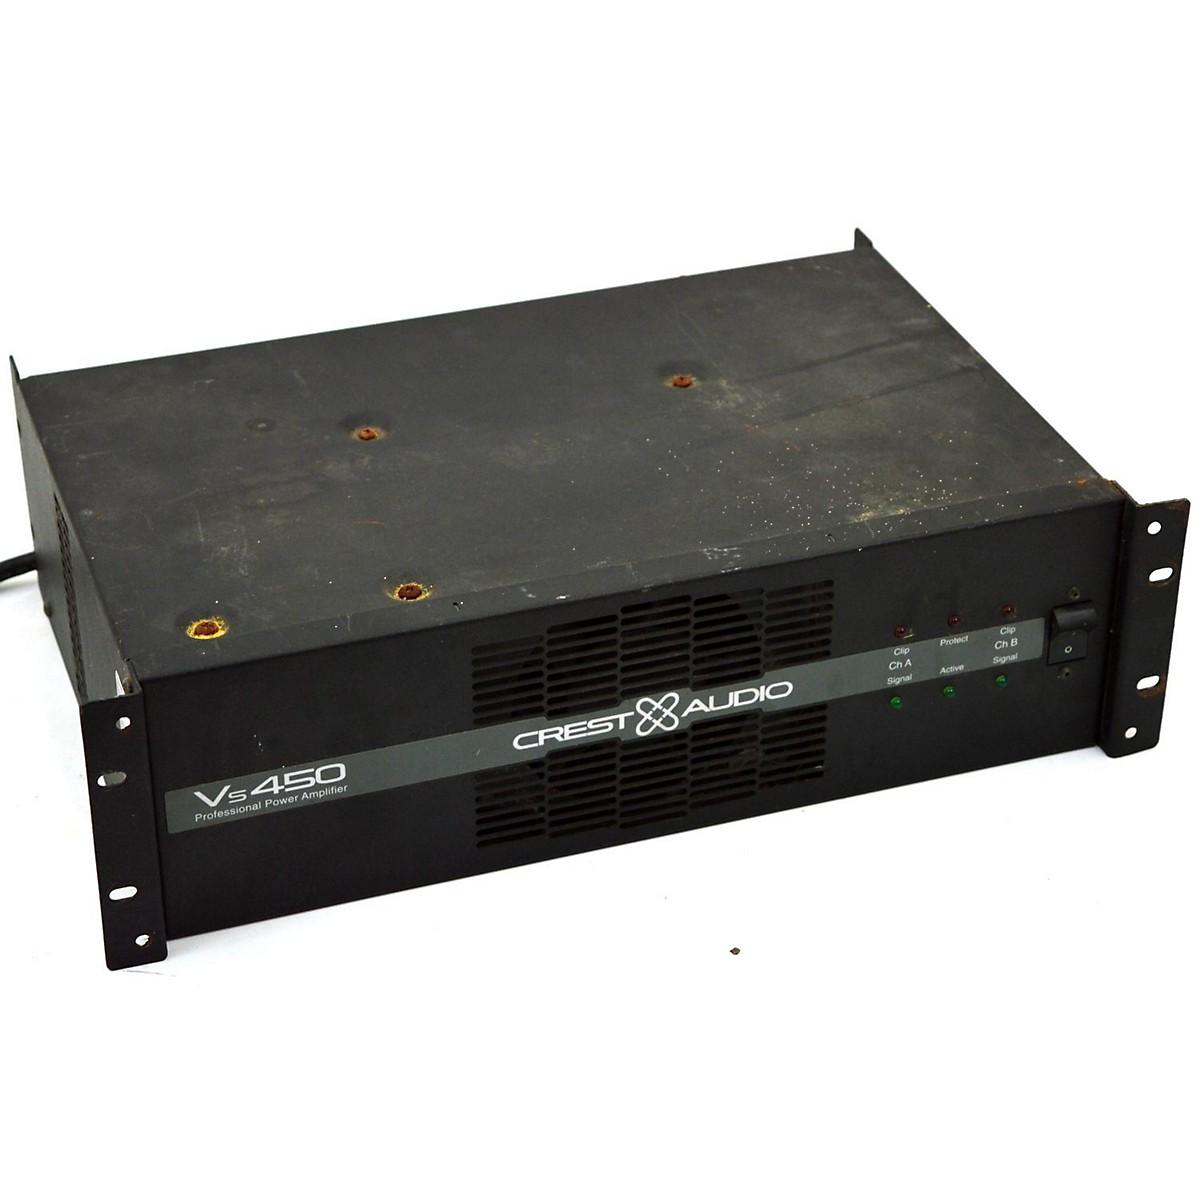 Crest Audio VS450 Power Amp